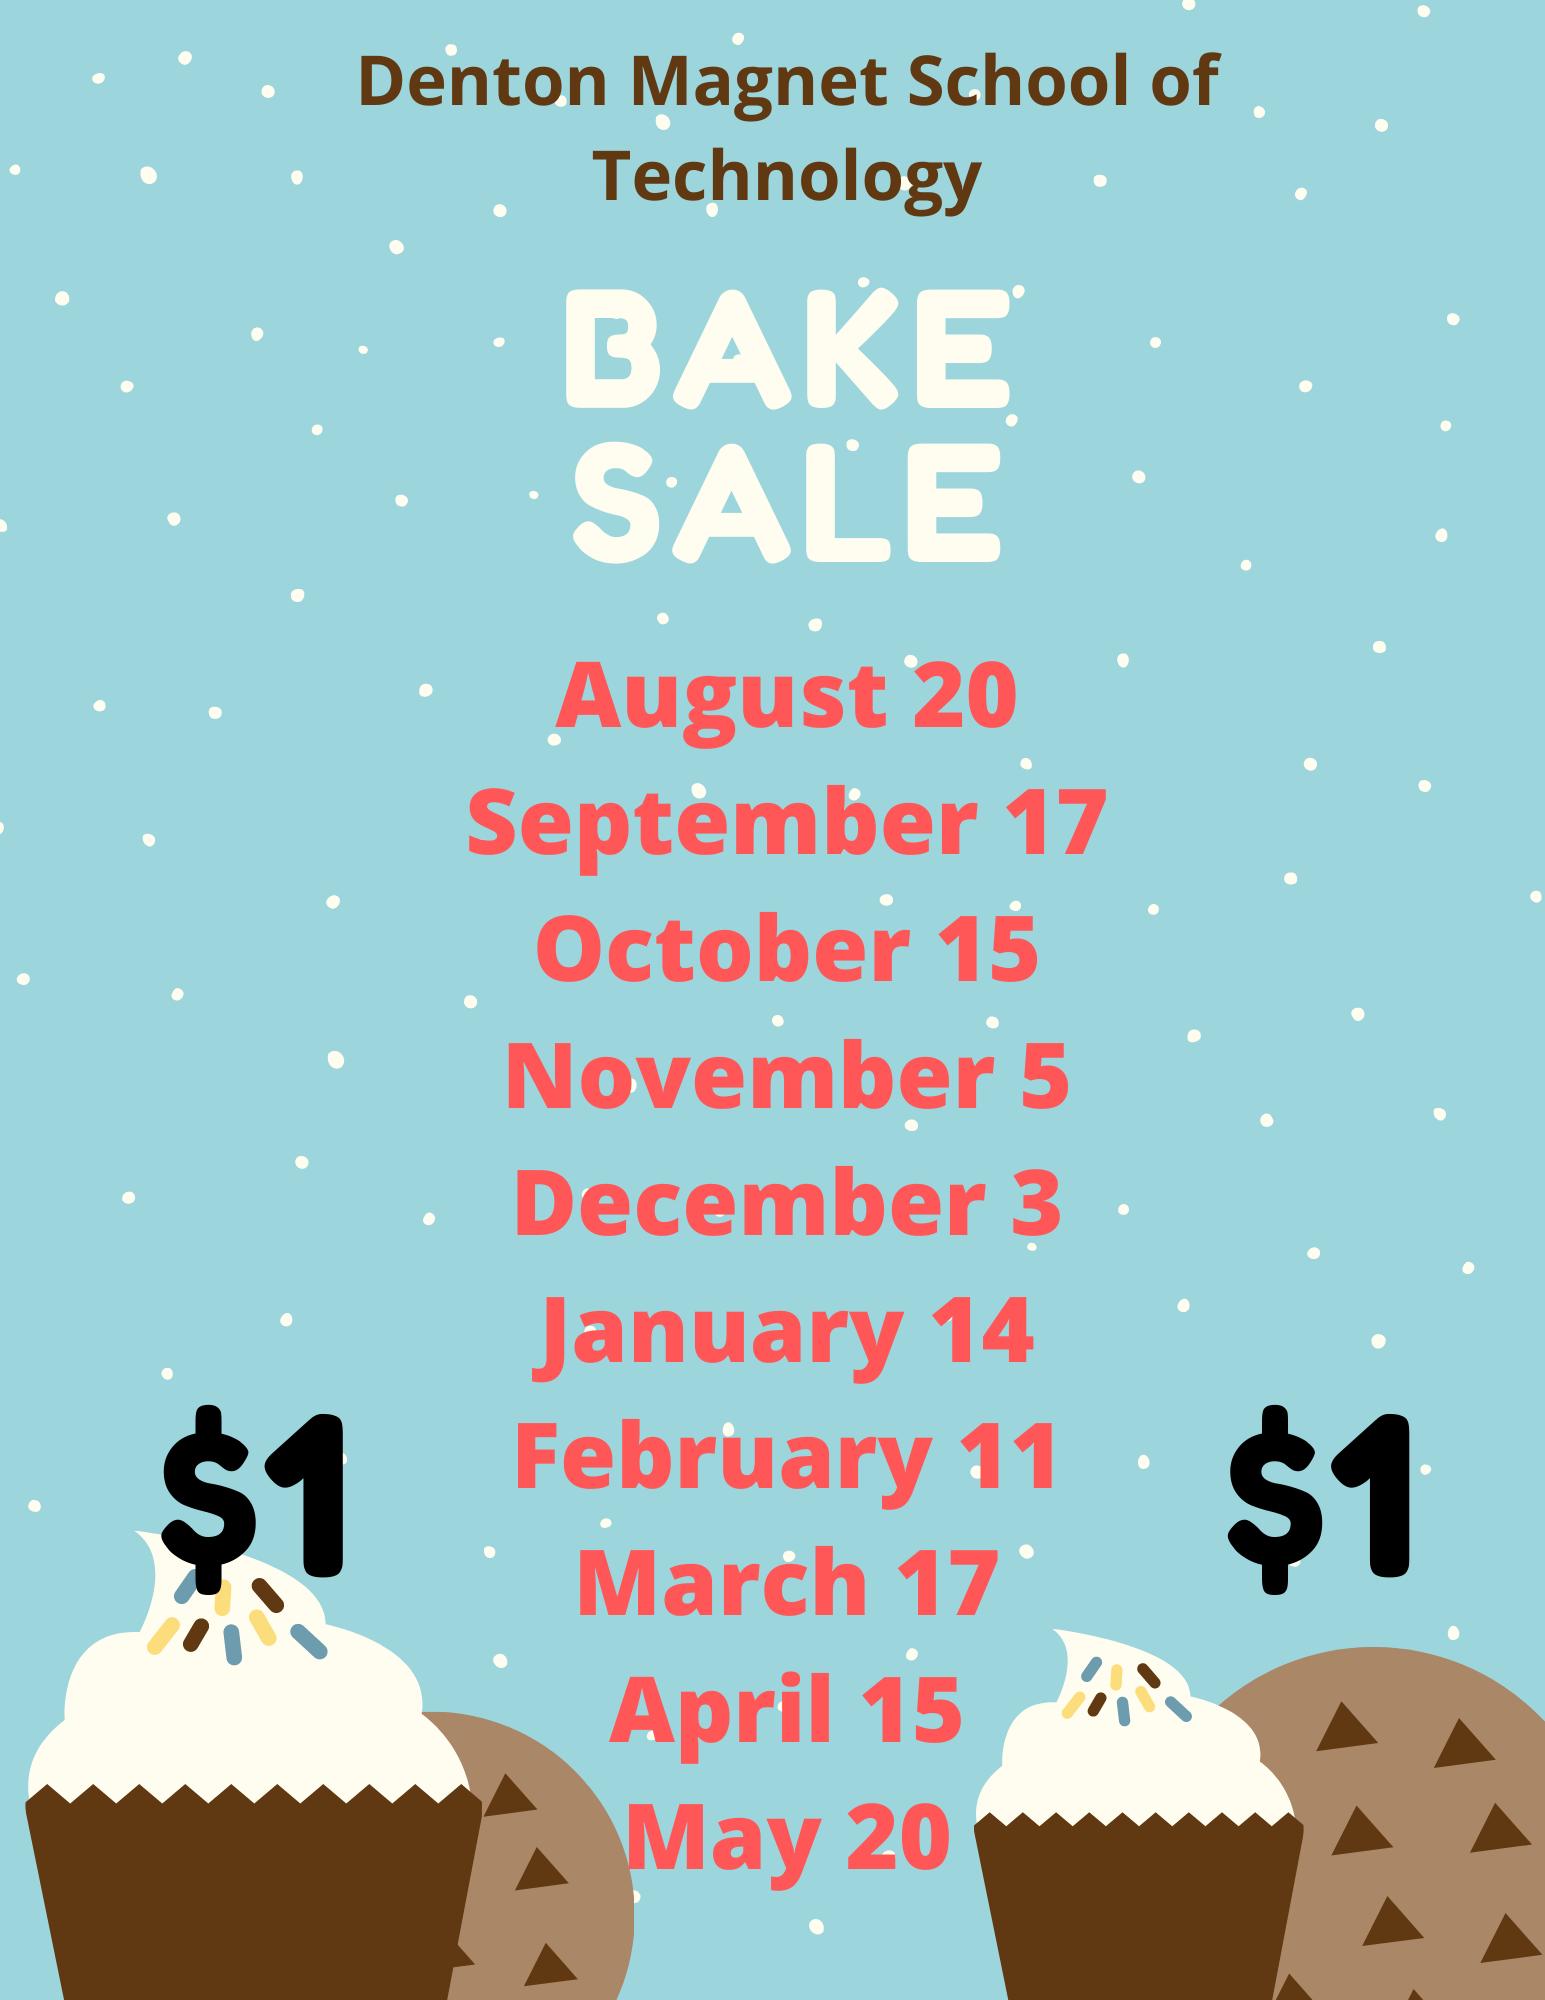 Denton Bake Sale Dates